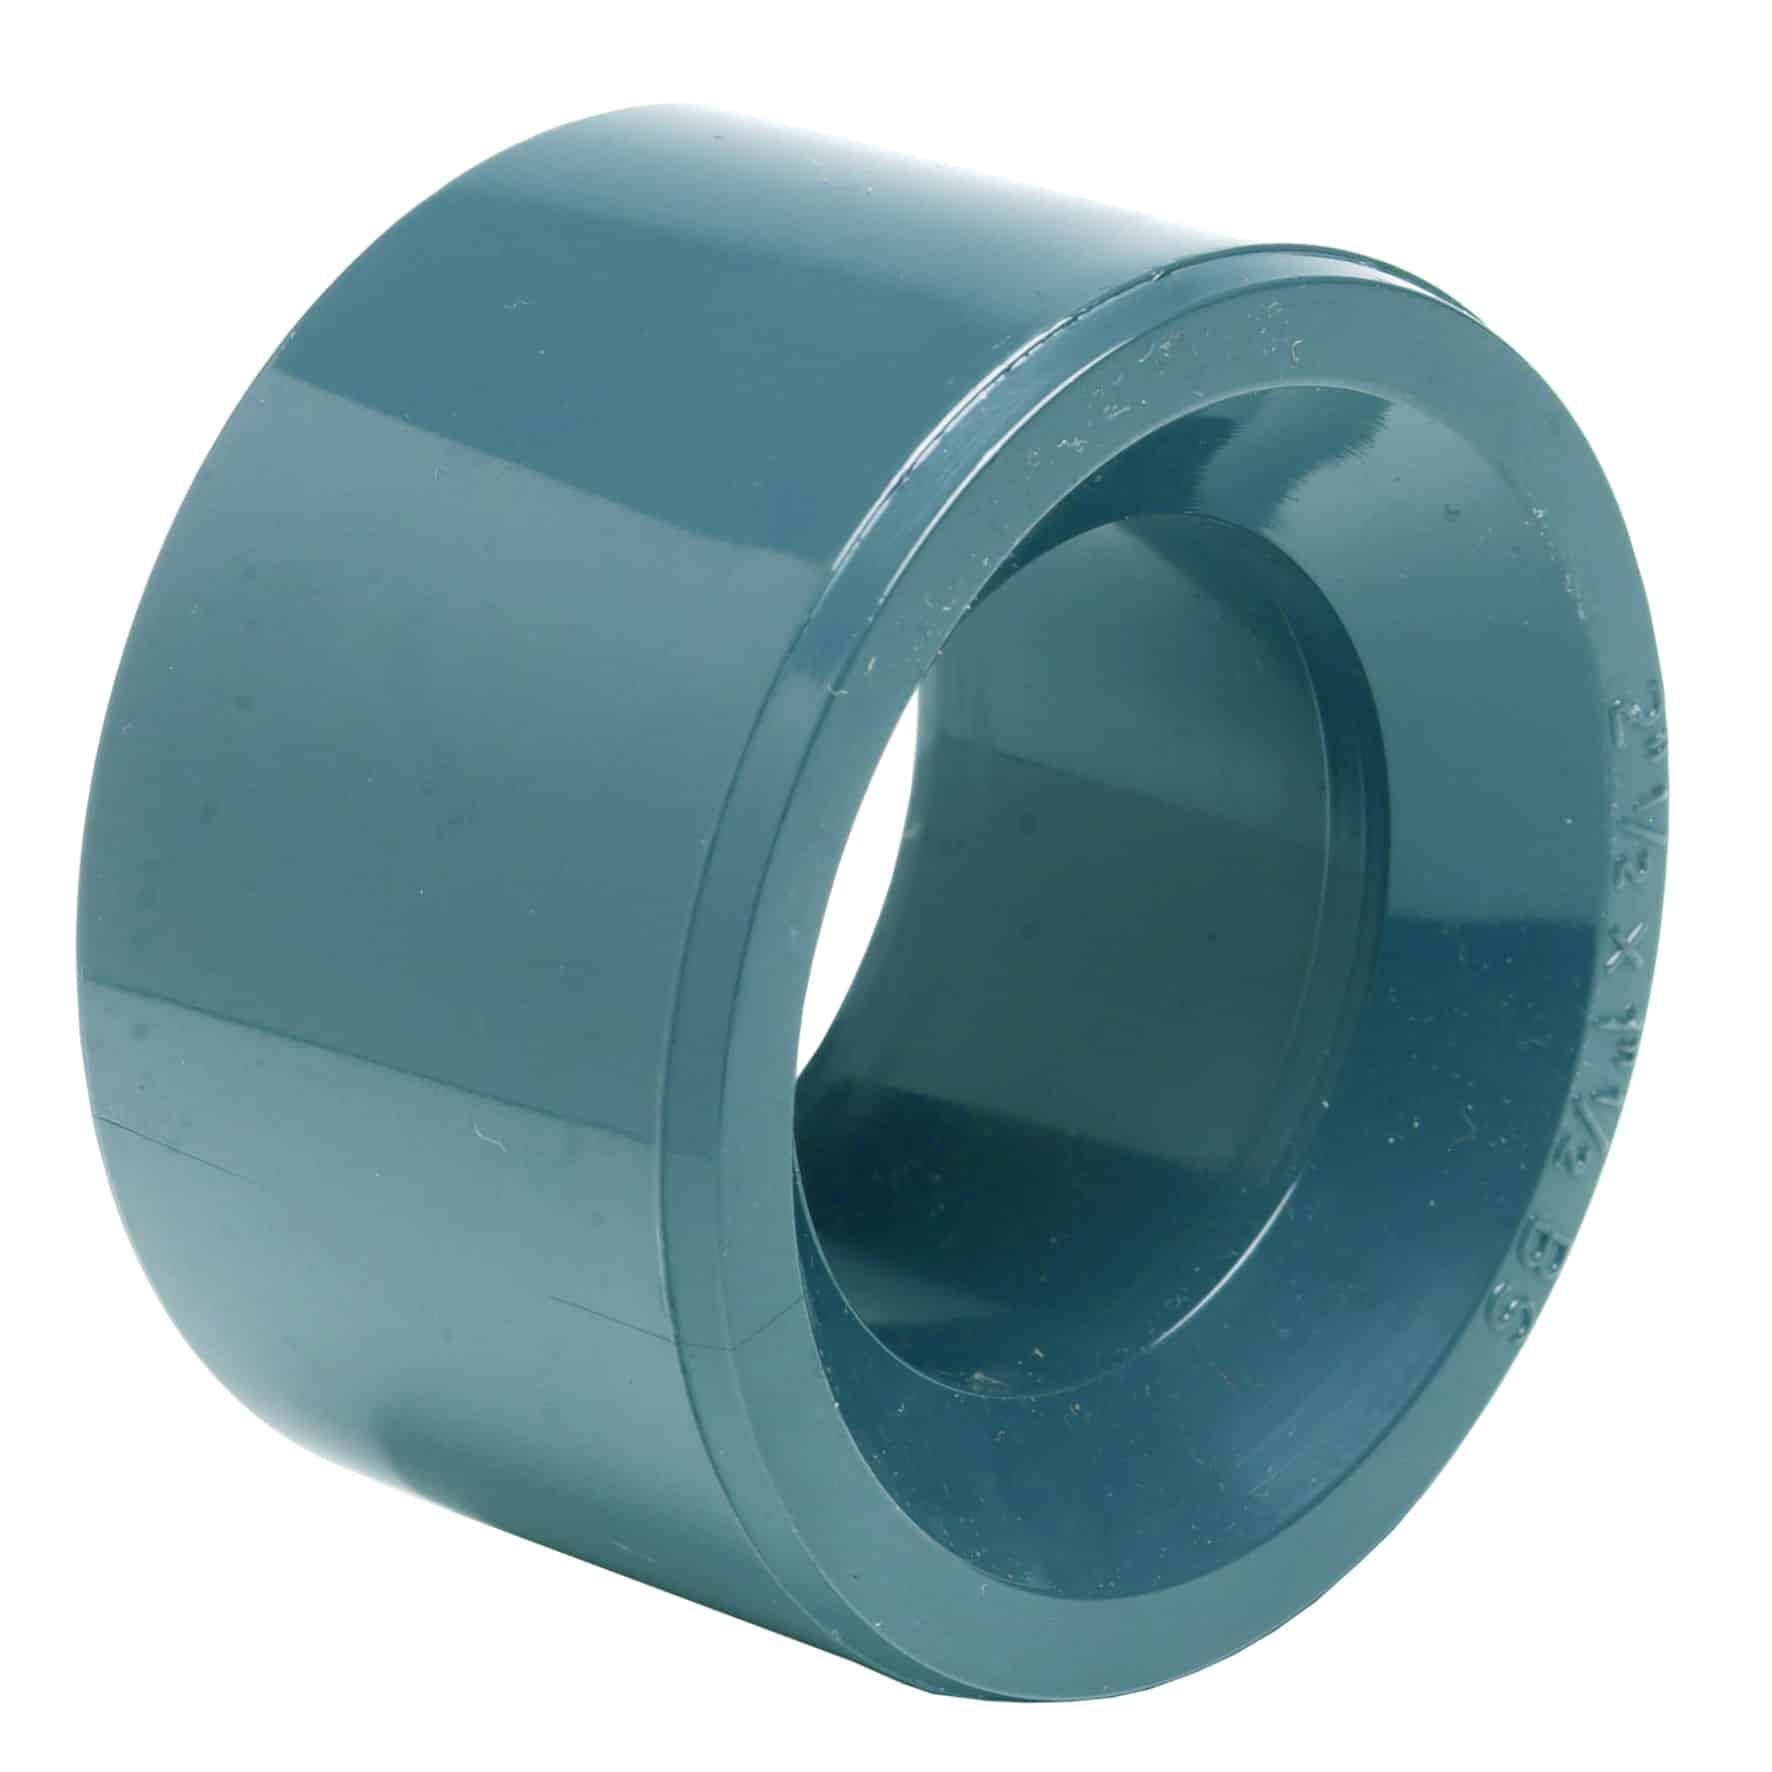 PVC-U riduzione lunga femmina/maschio - femmina - EFFAST - 100% Made in Italy